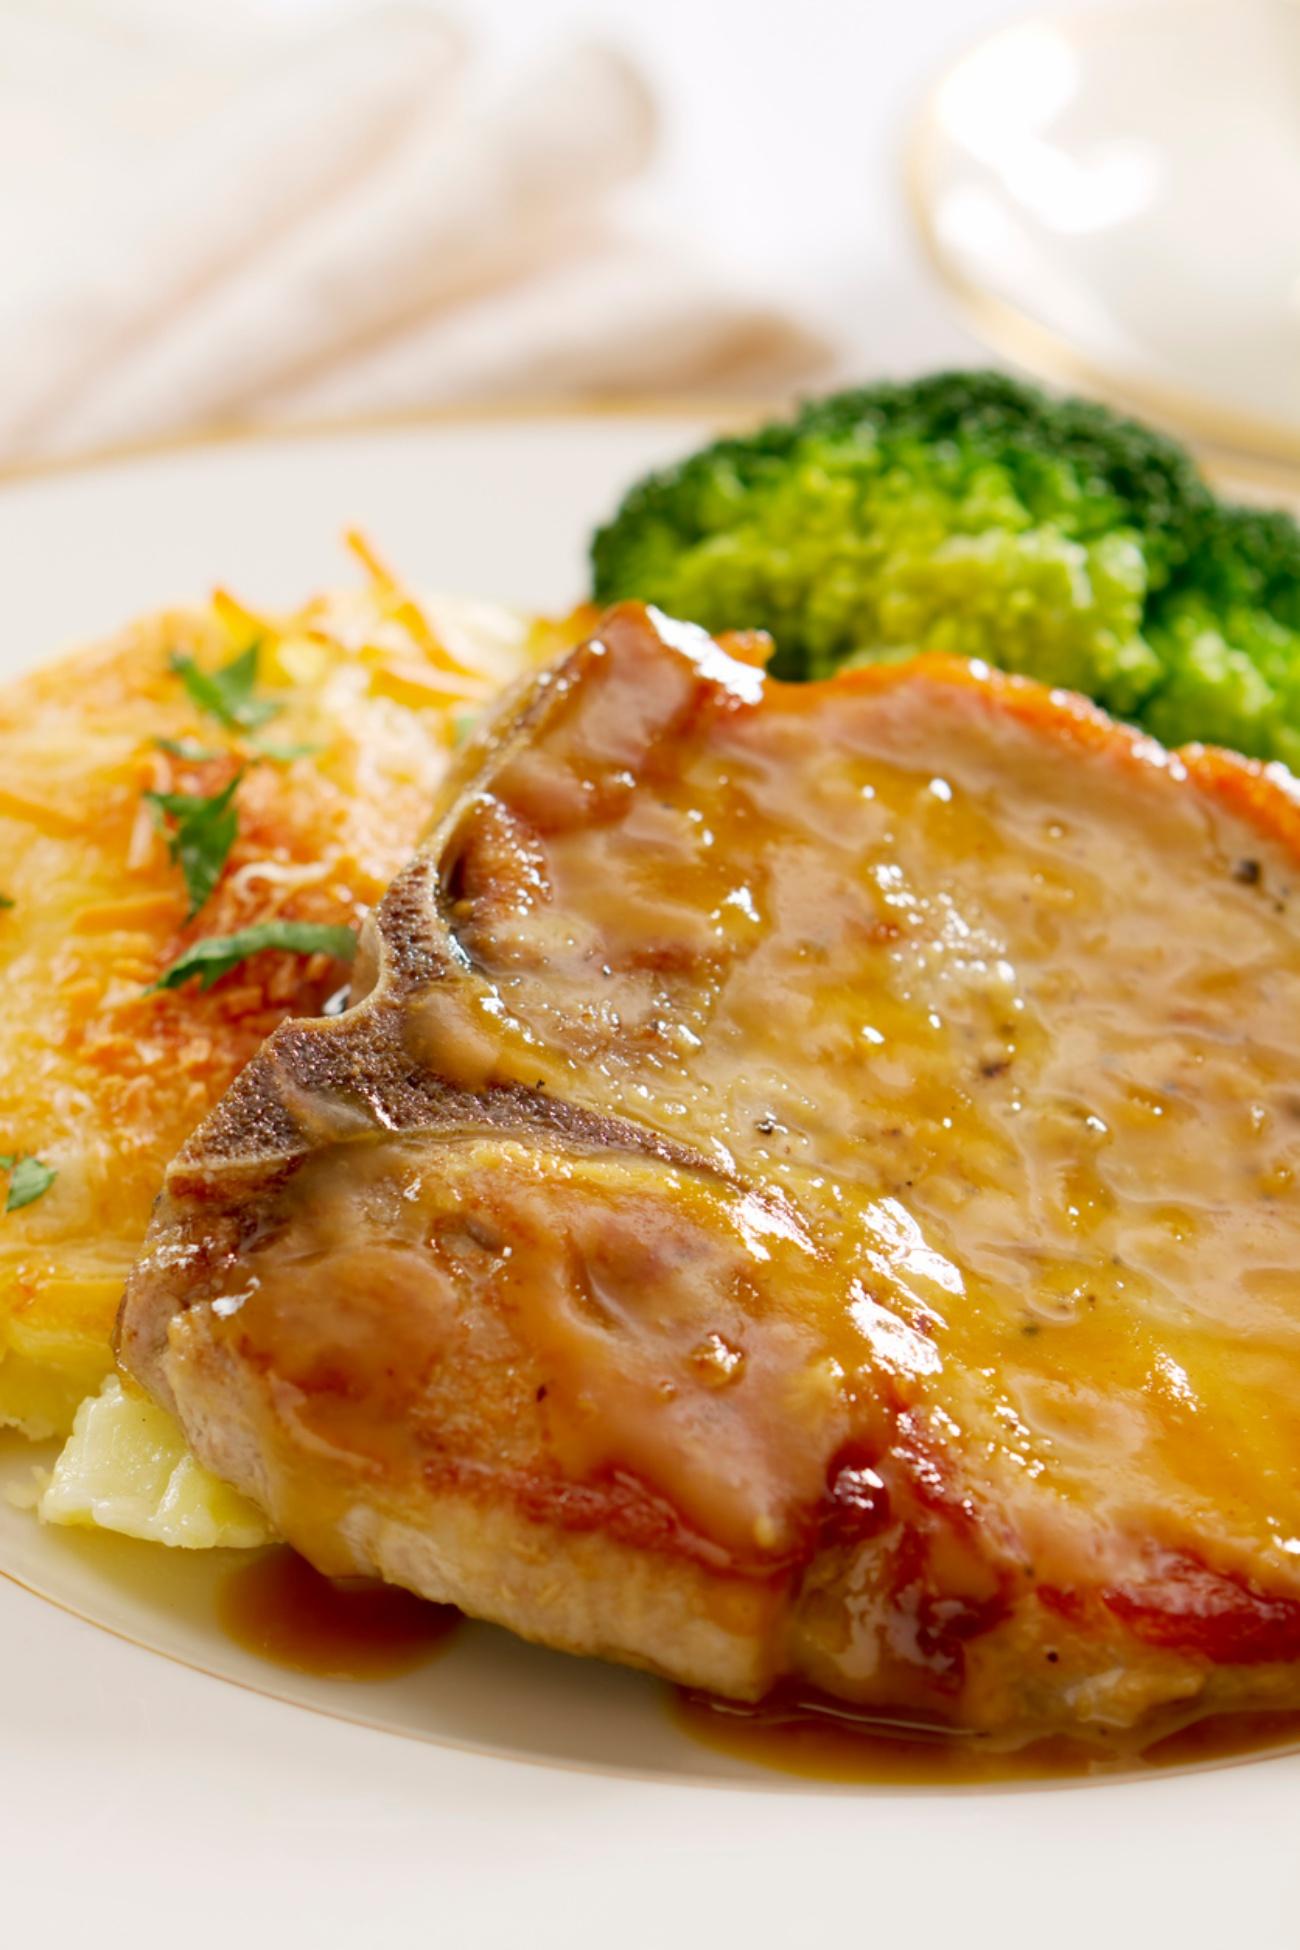 Mustard and Honey Glazed Pork Chop